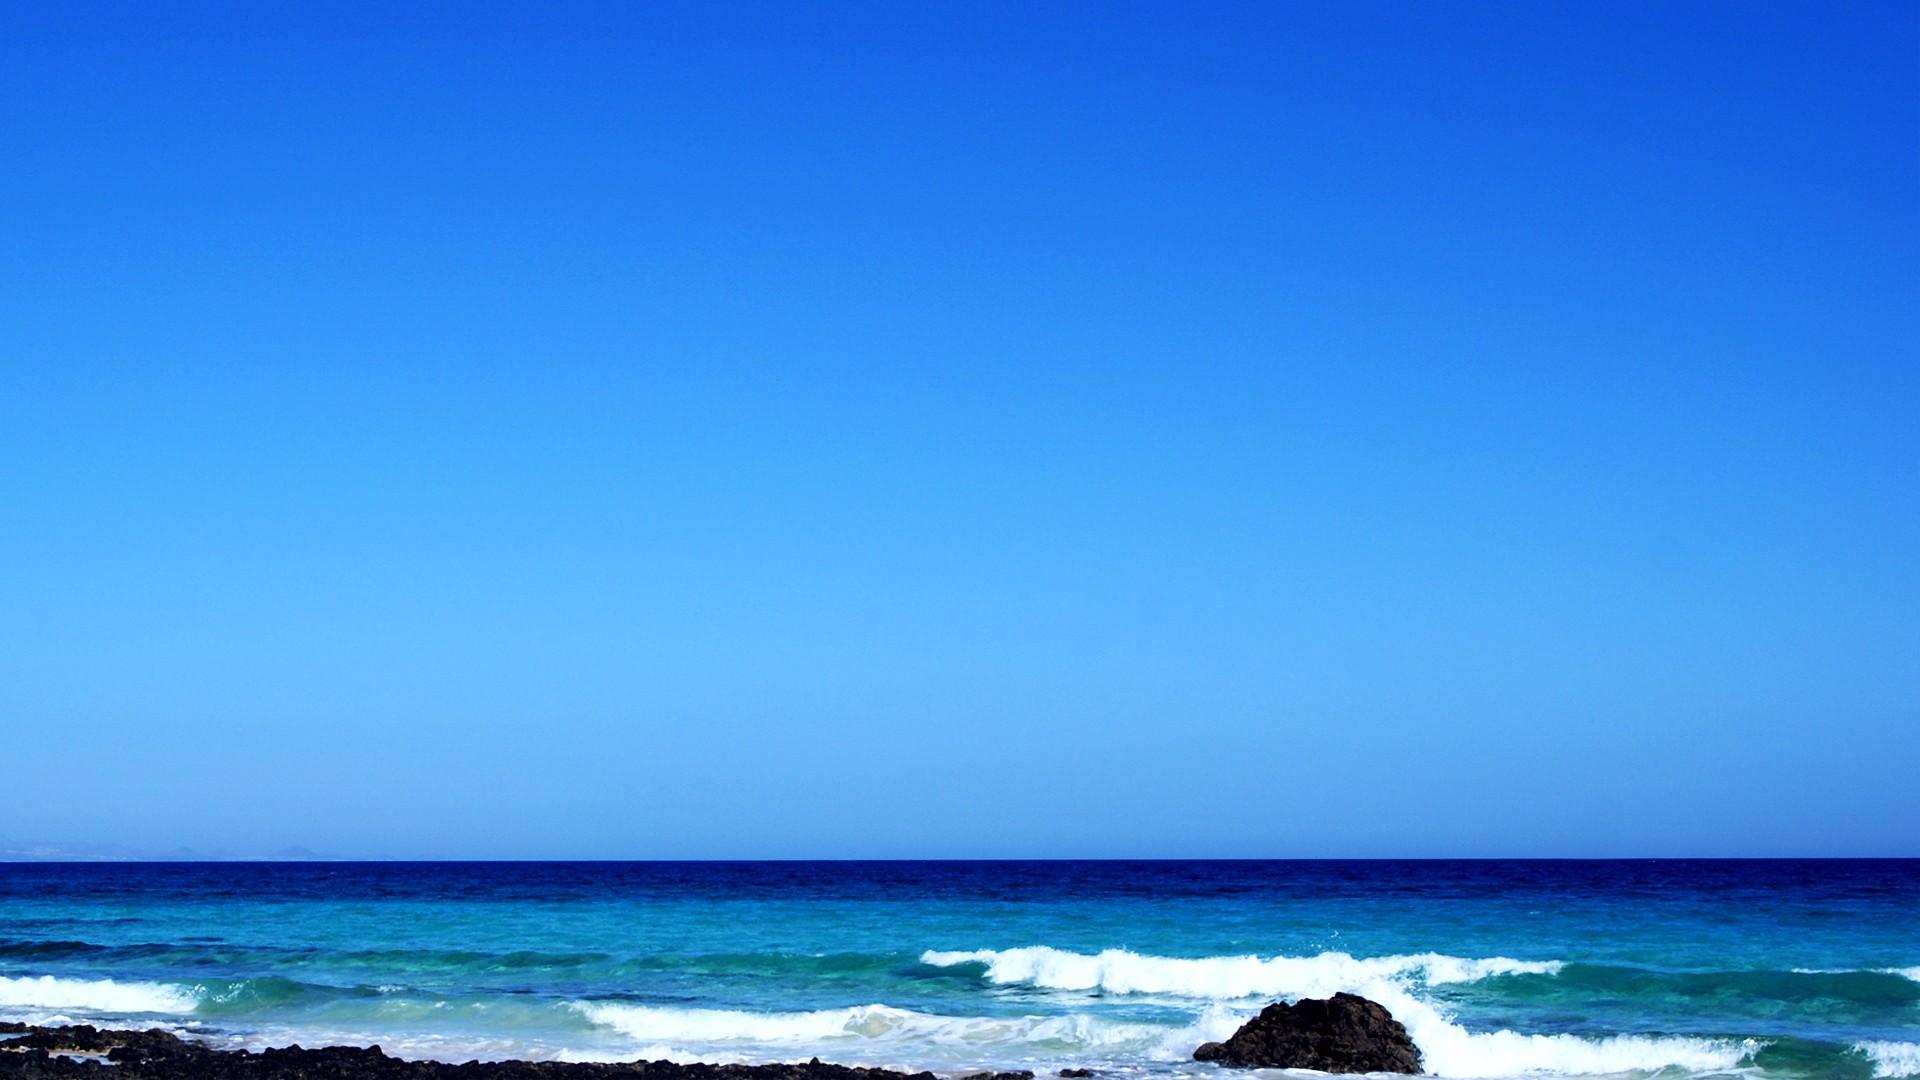 Blue Ocean Background wallpaper   1143099 1920x1080